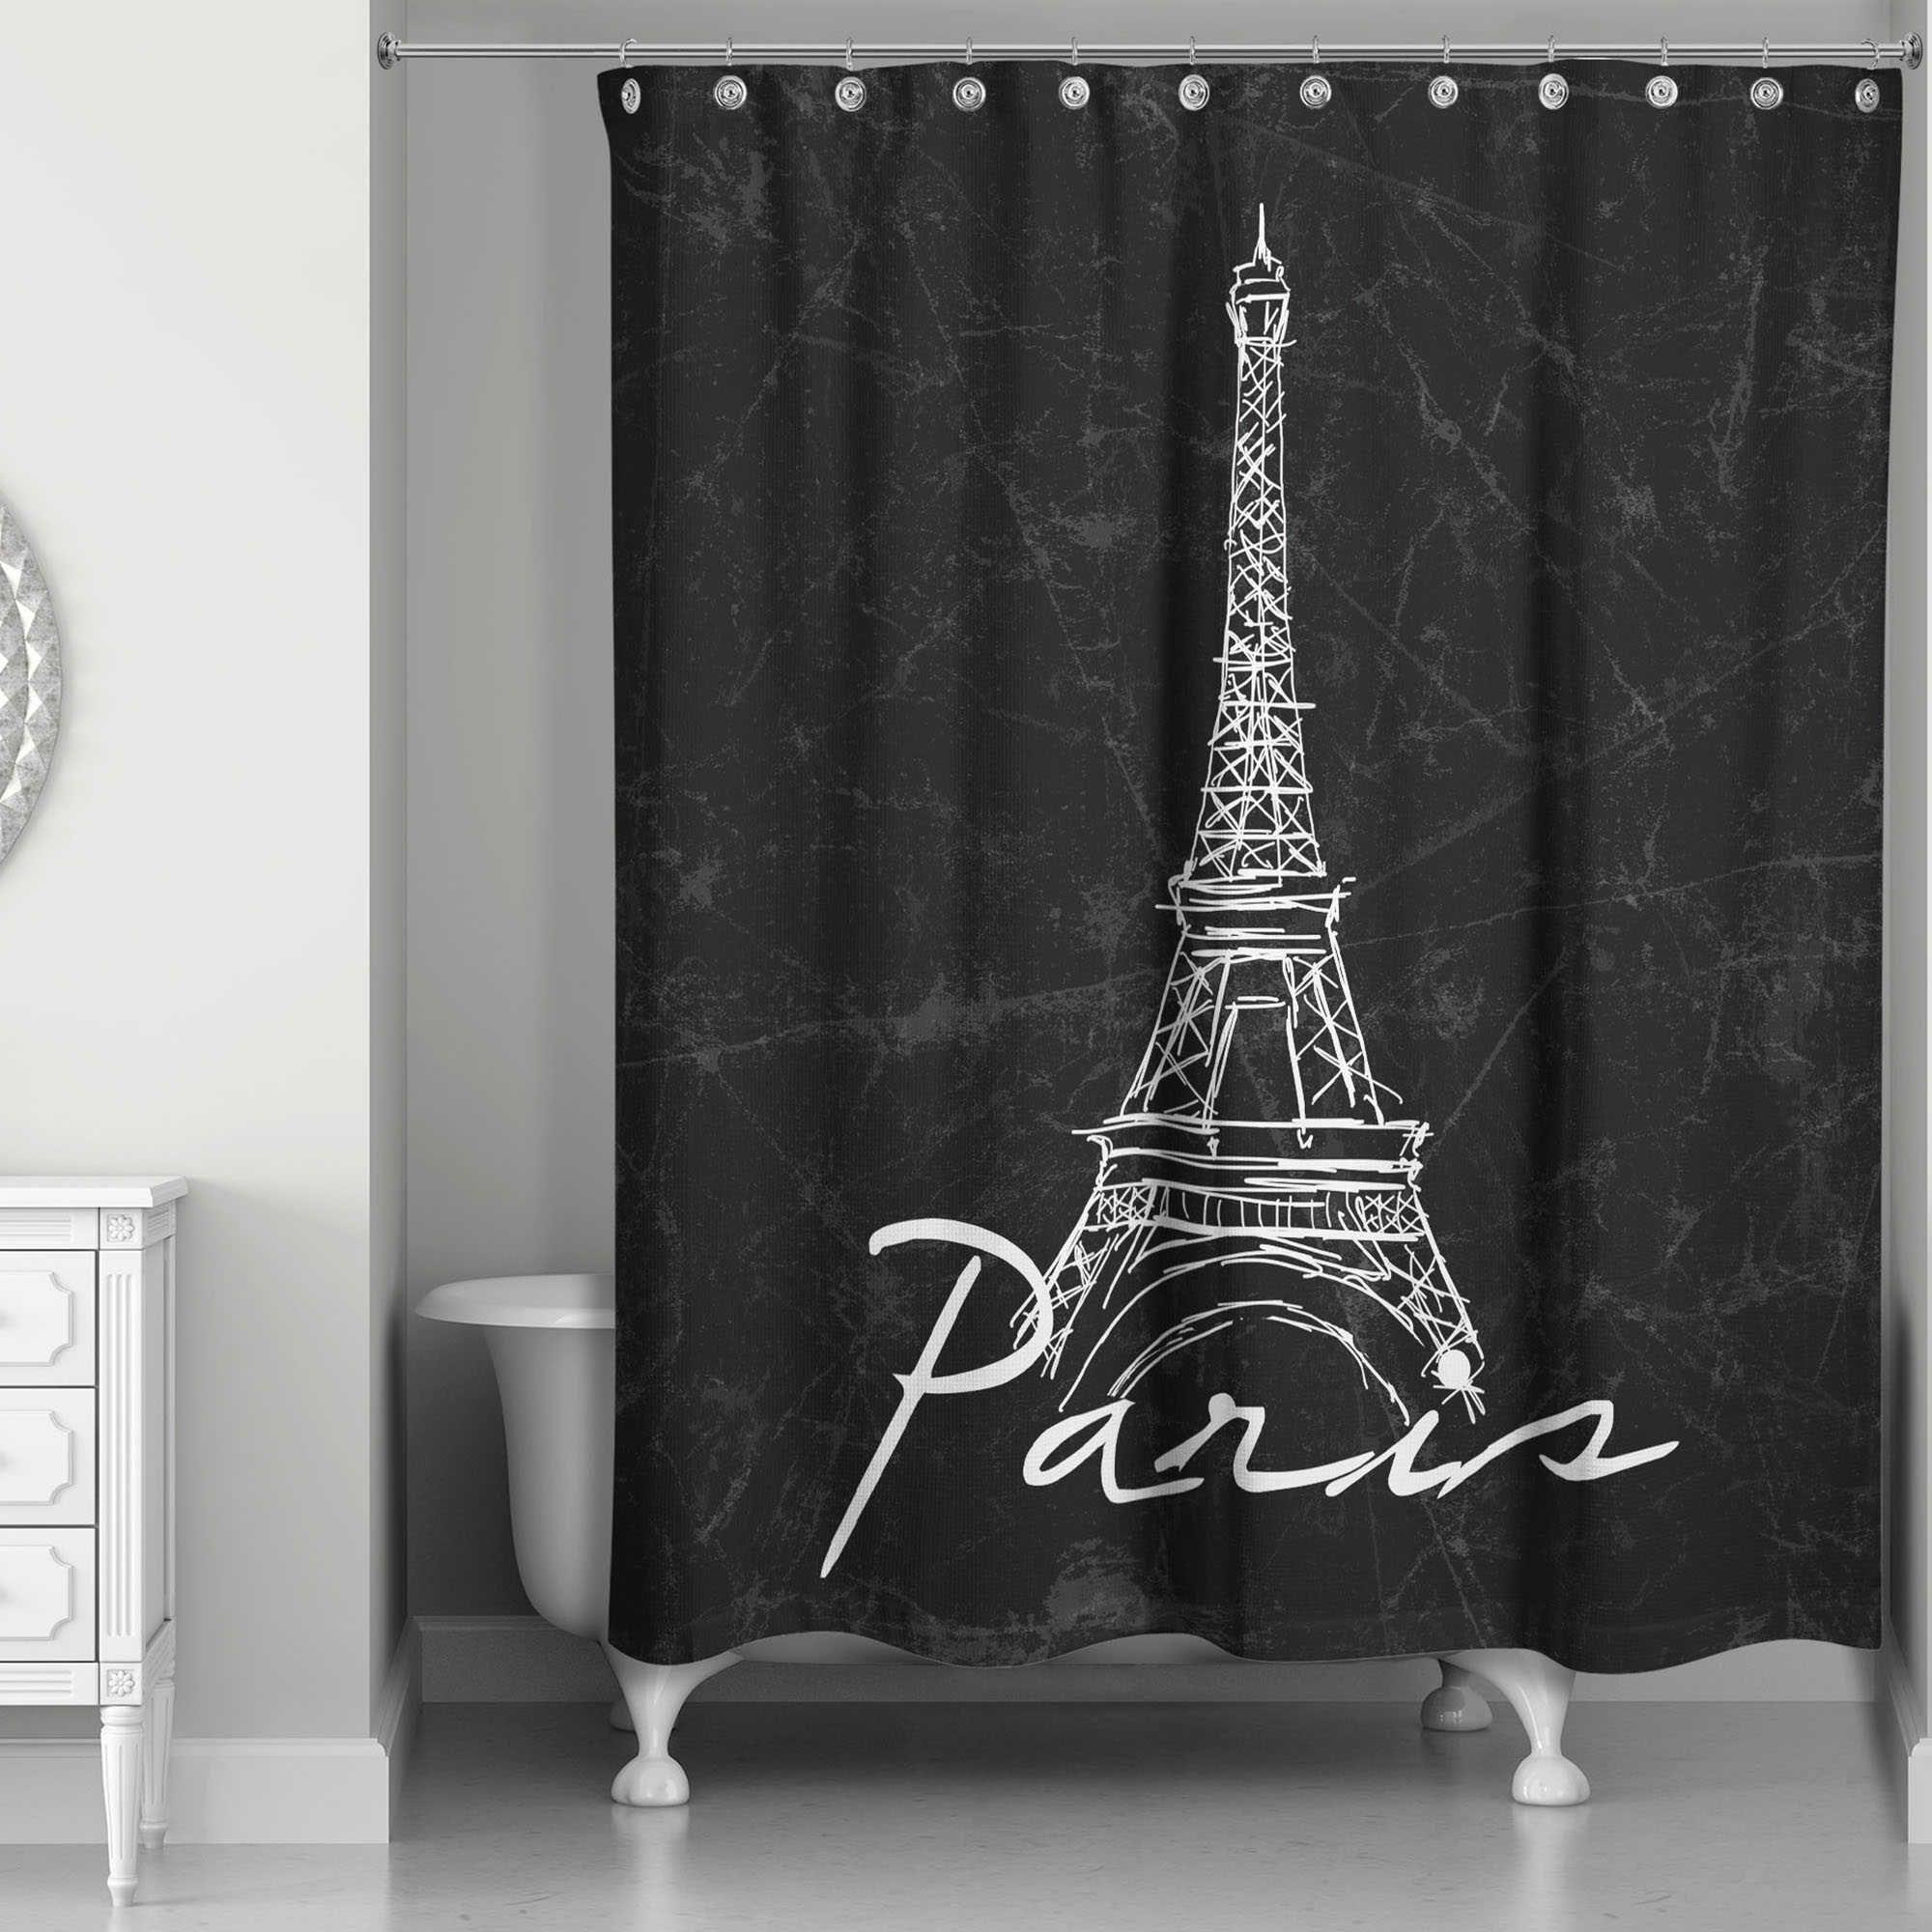 Designs Direct Eiffel Tower Sketch Shower Curtain In Black White